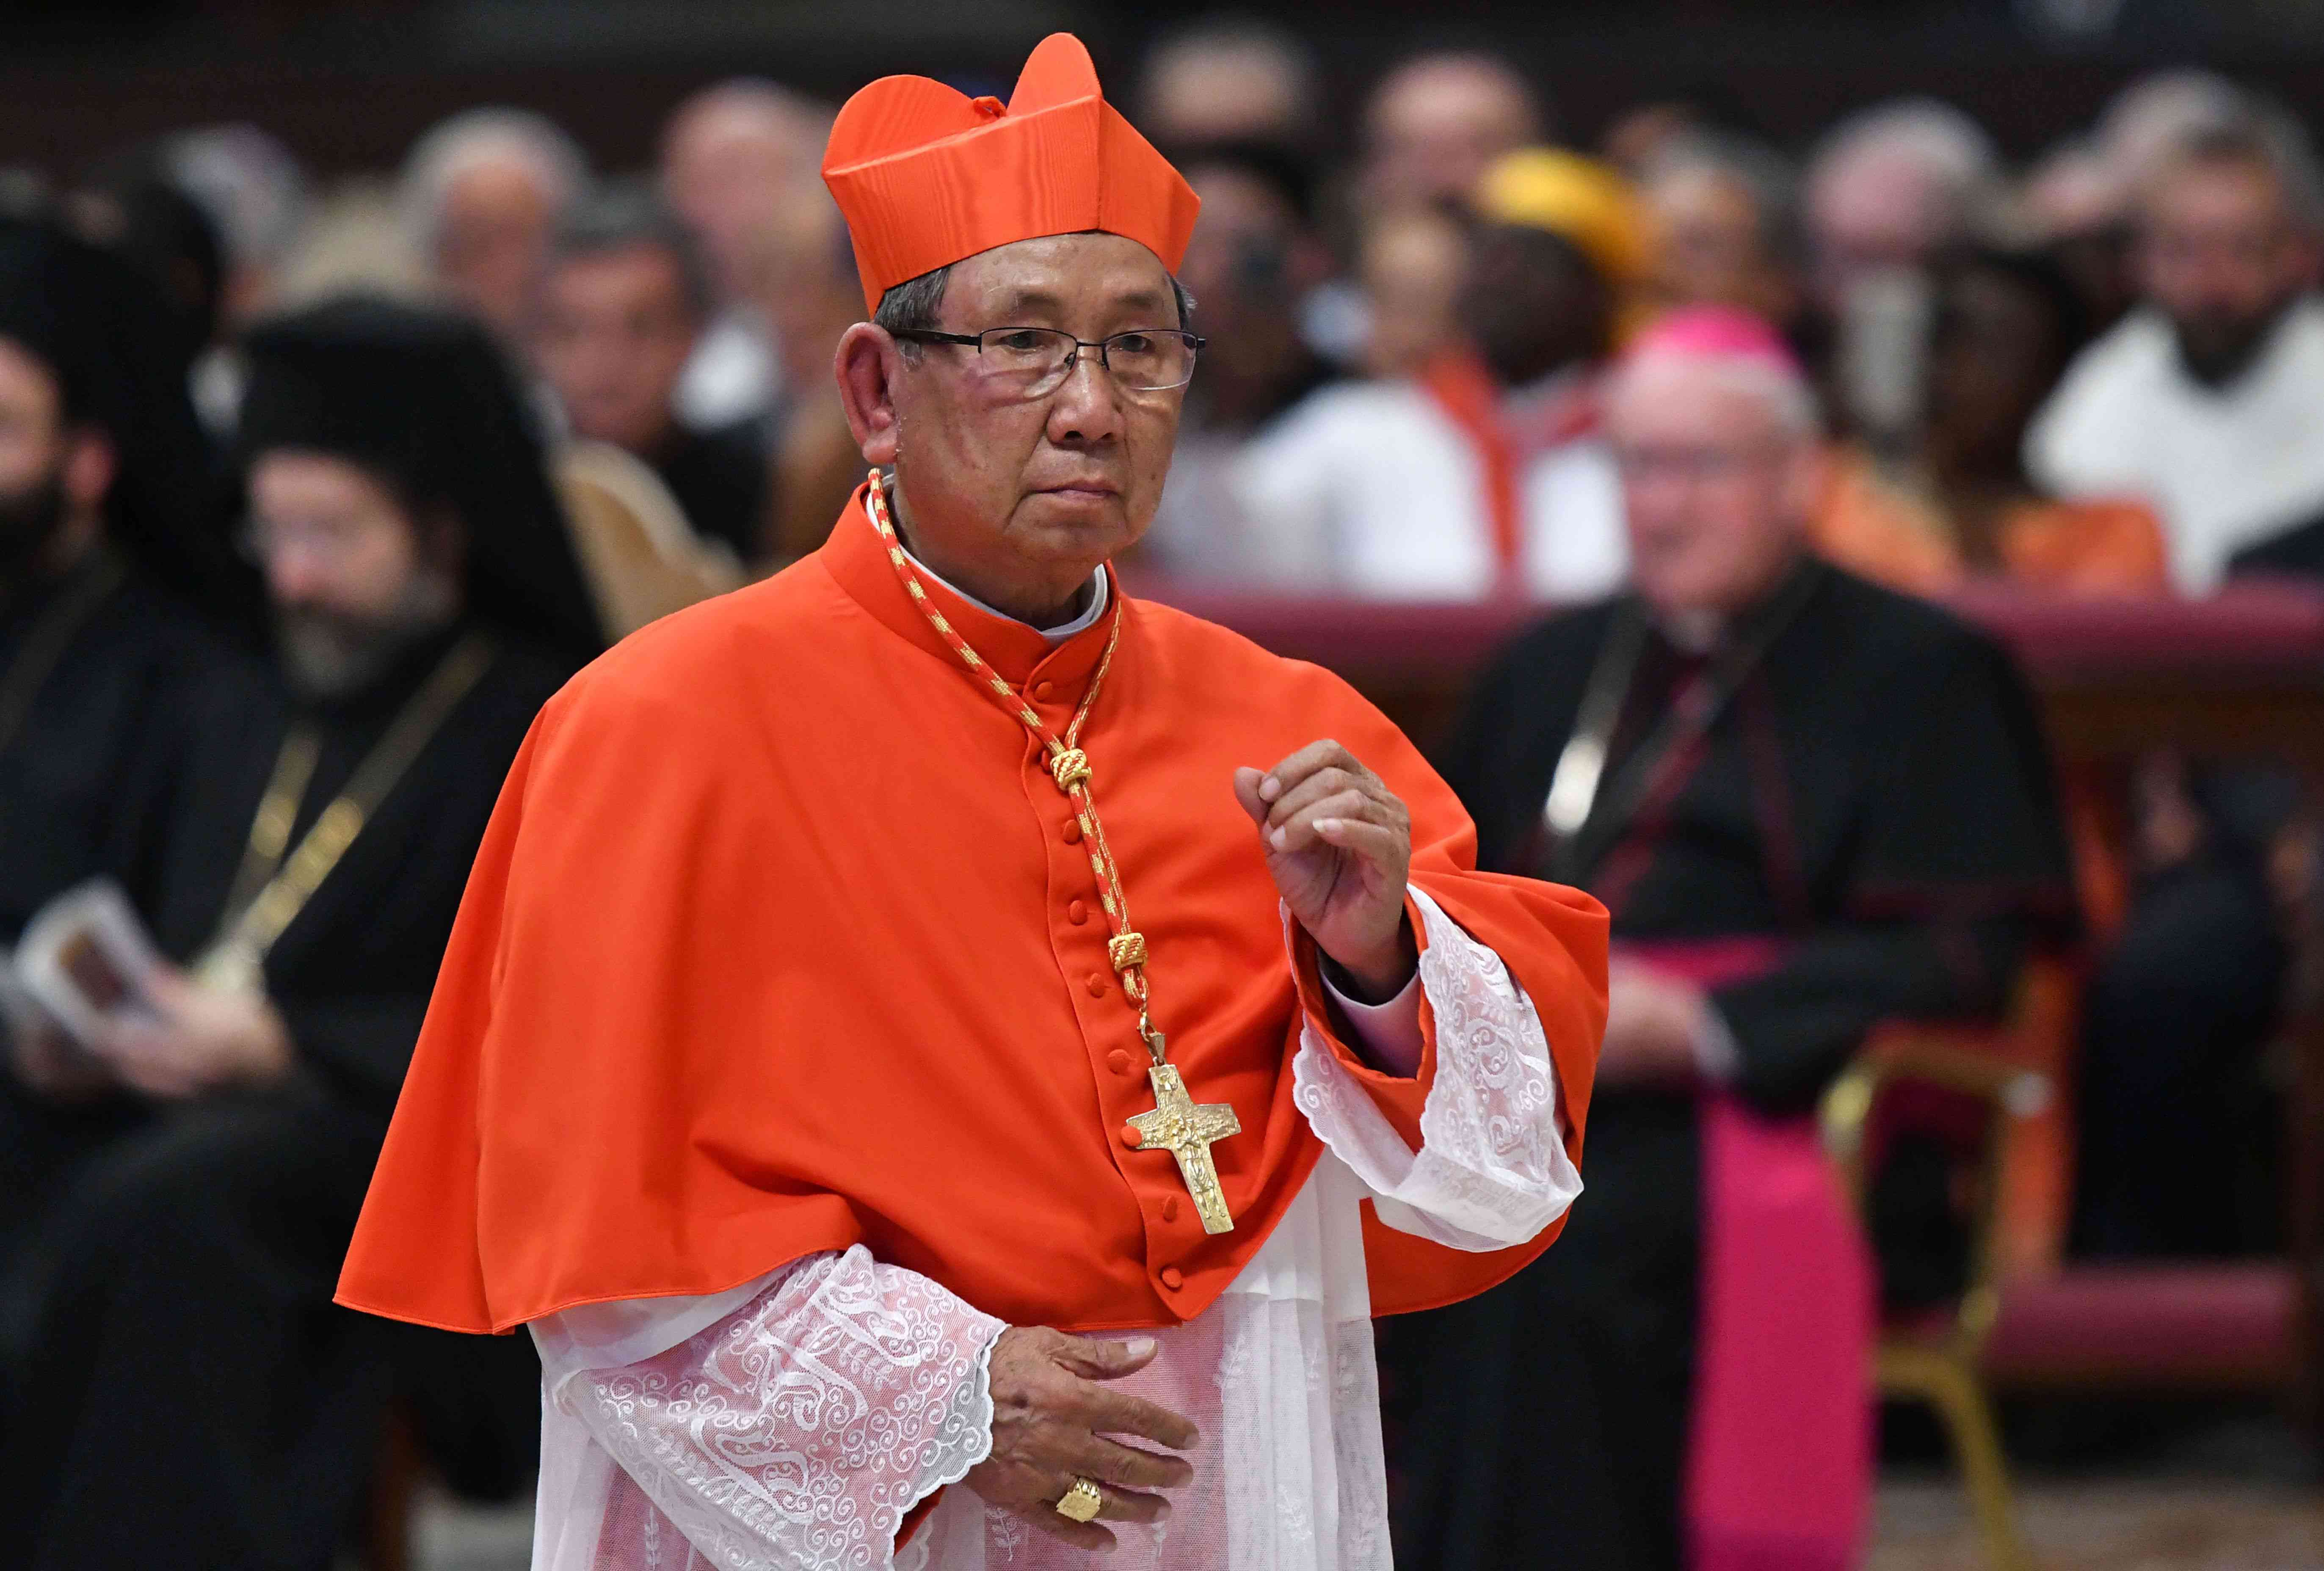 Apostolic vicar of Paksé Louis-Marie Ling Mangkhanekhoun from Laos